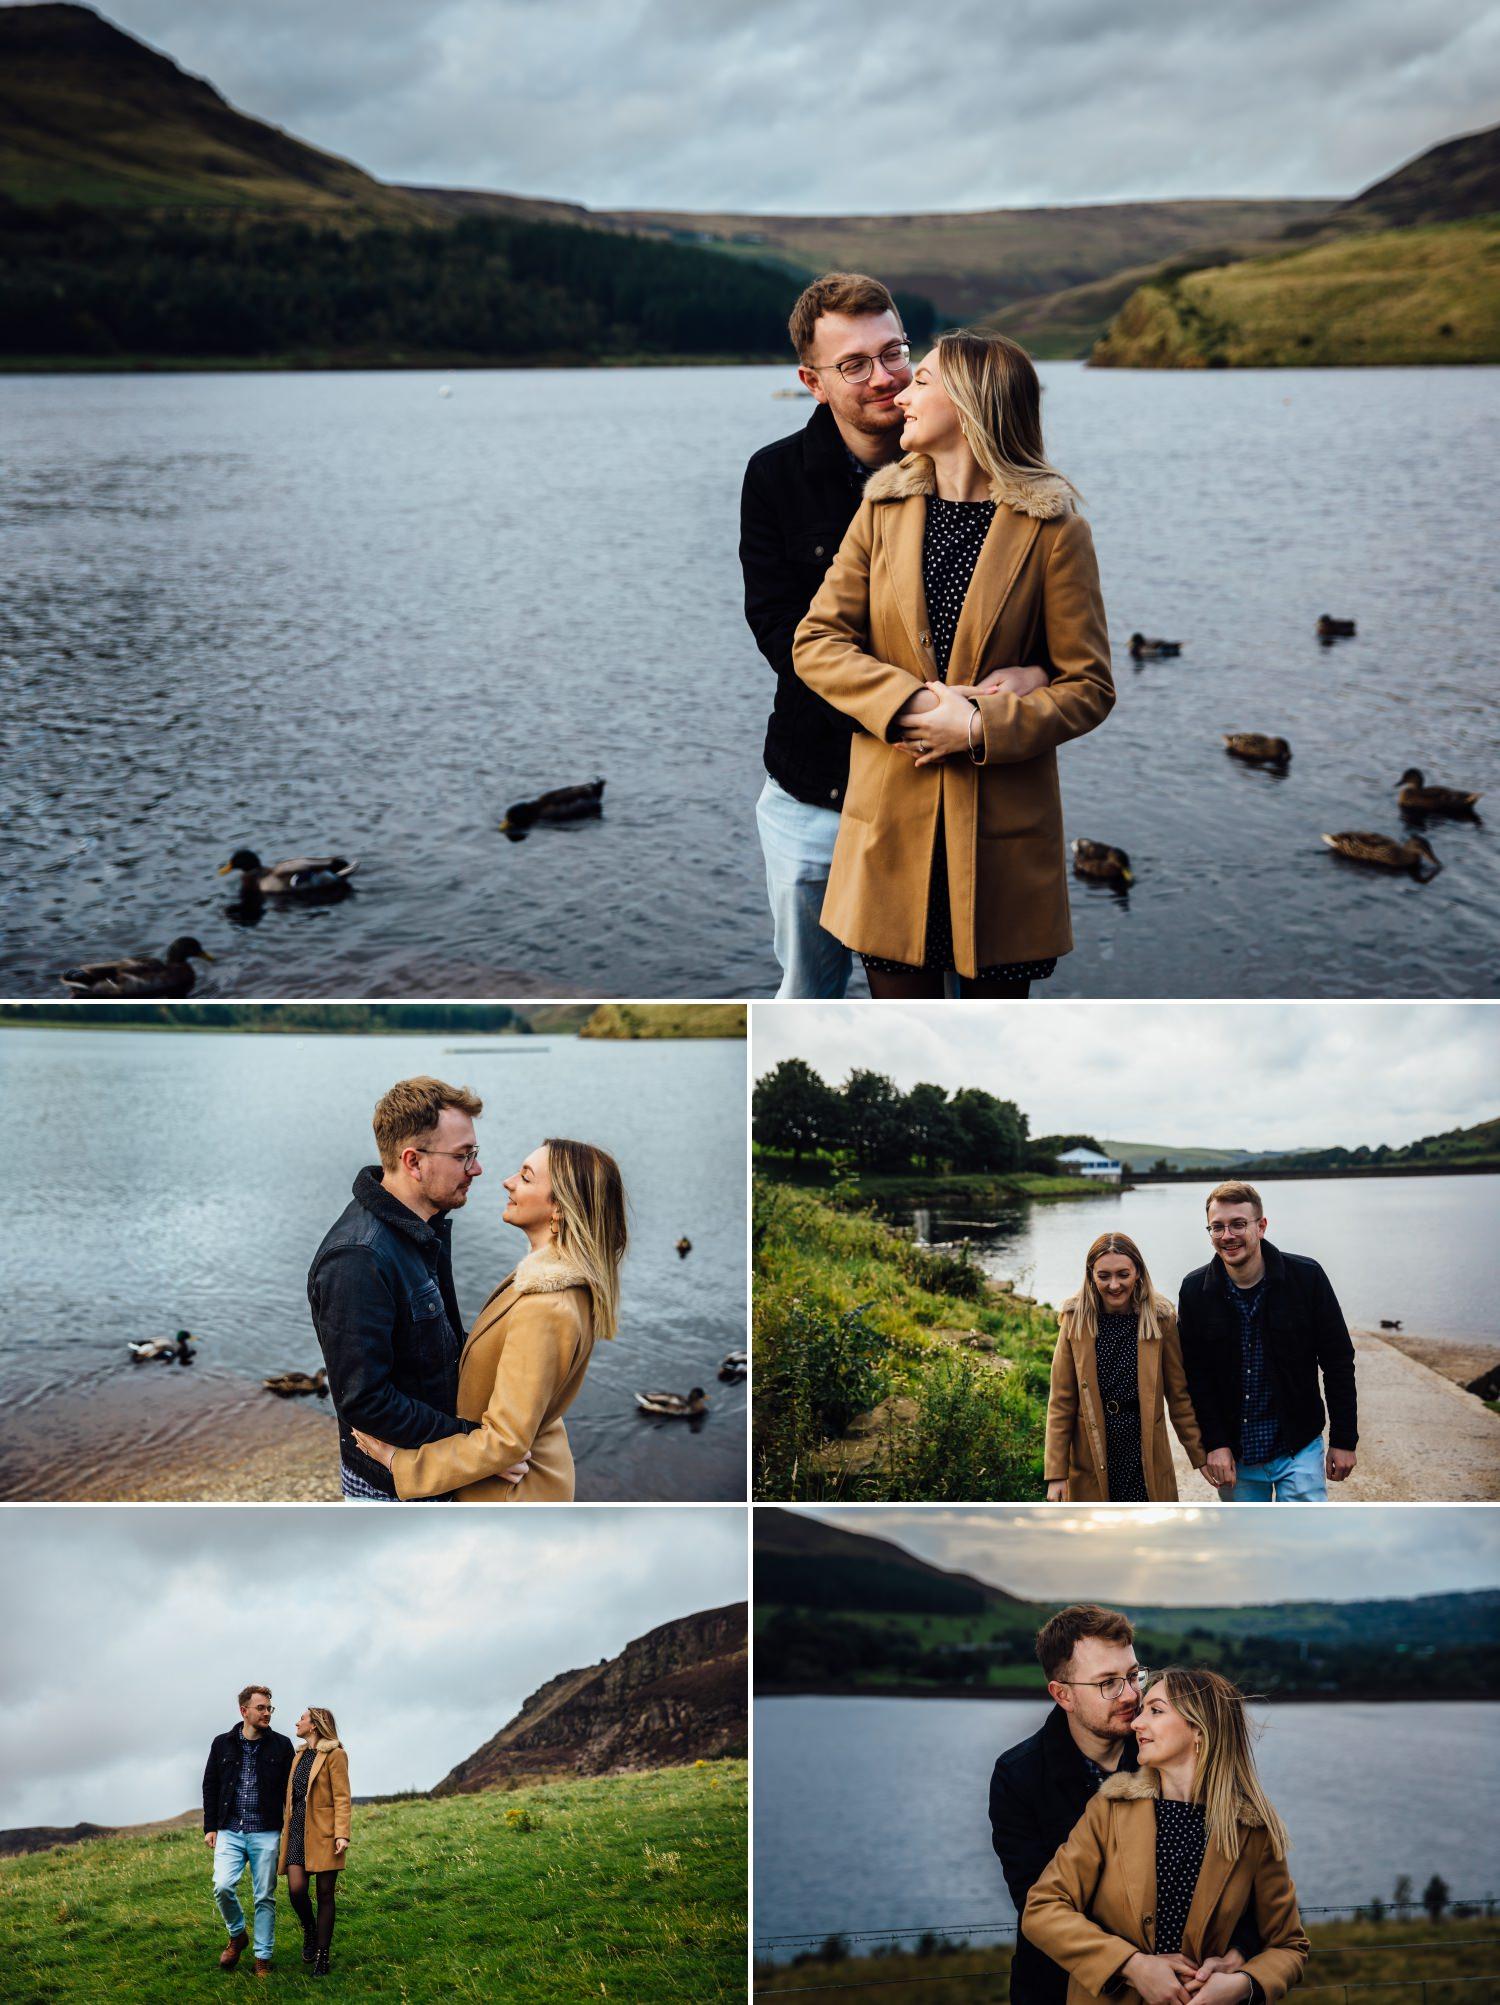 Wedding shoot of couple by ducks in Dovestone Reservoir